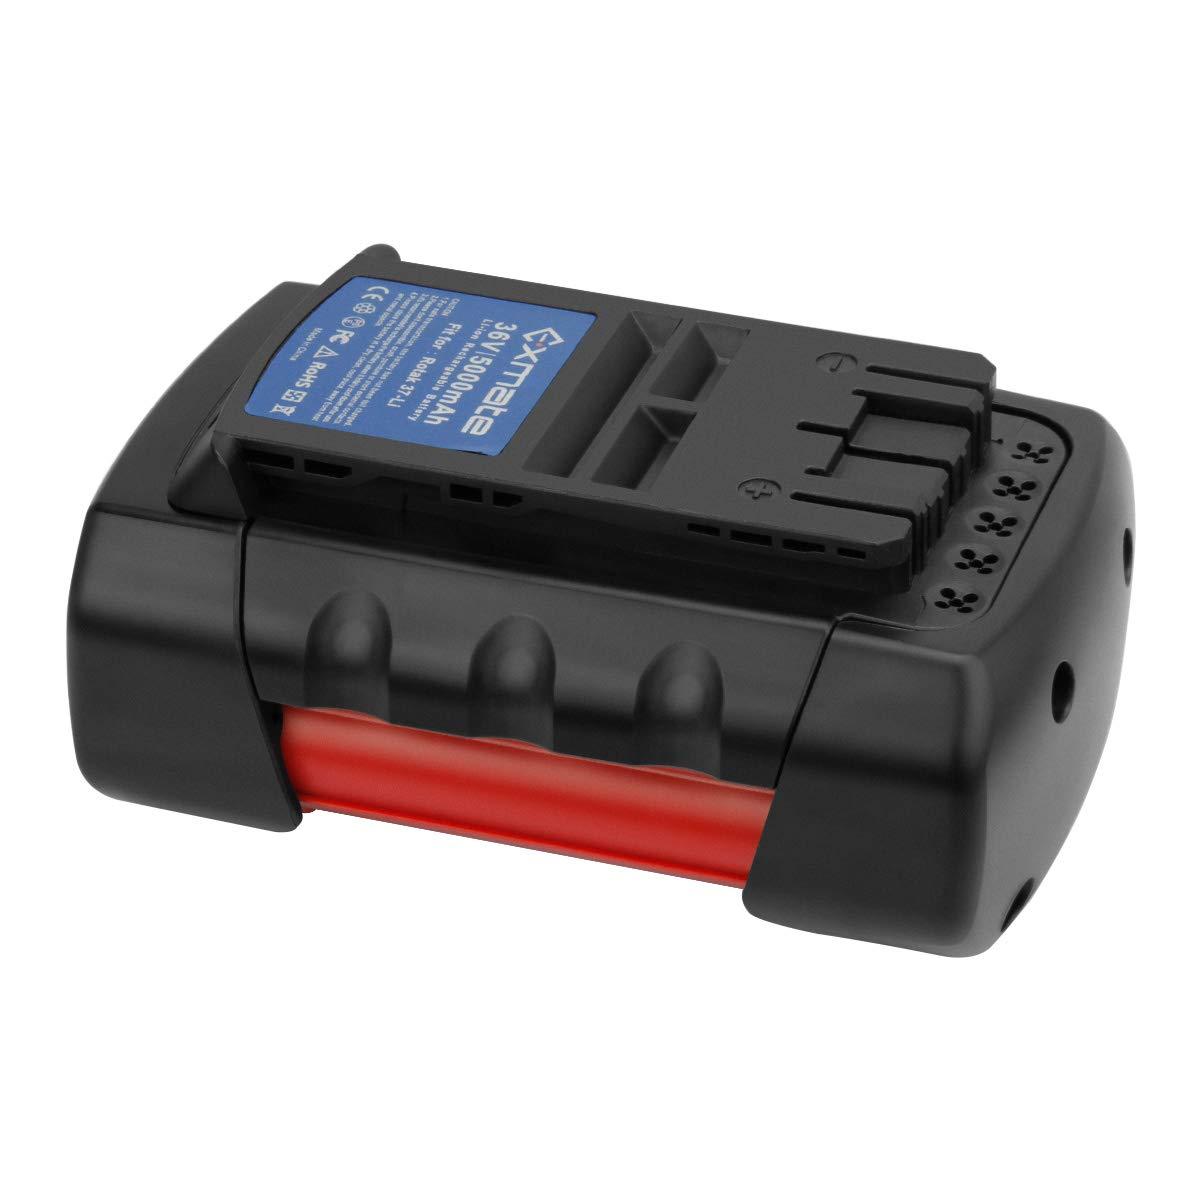 Exmate 36V Batería compatible con Bosch Rotak 32 LI, 34 LI, 37 LI ...